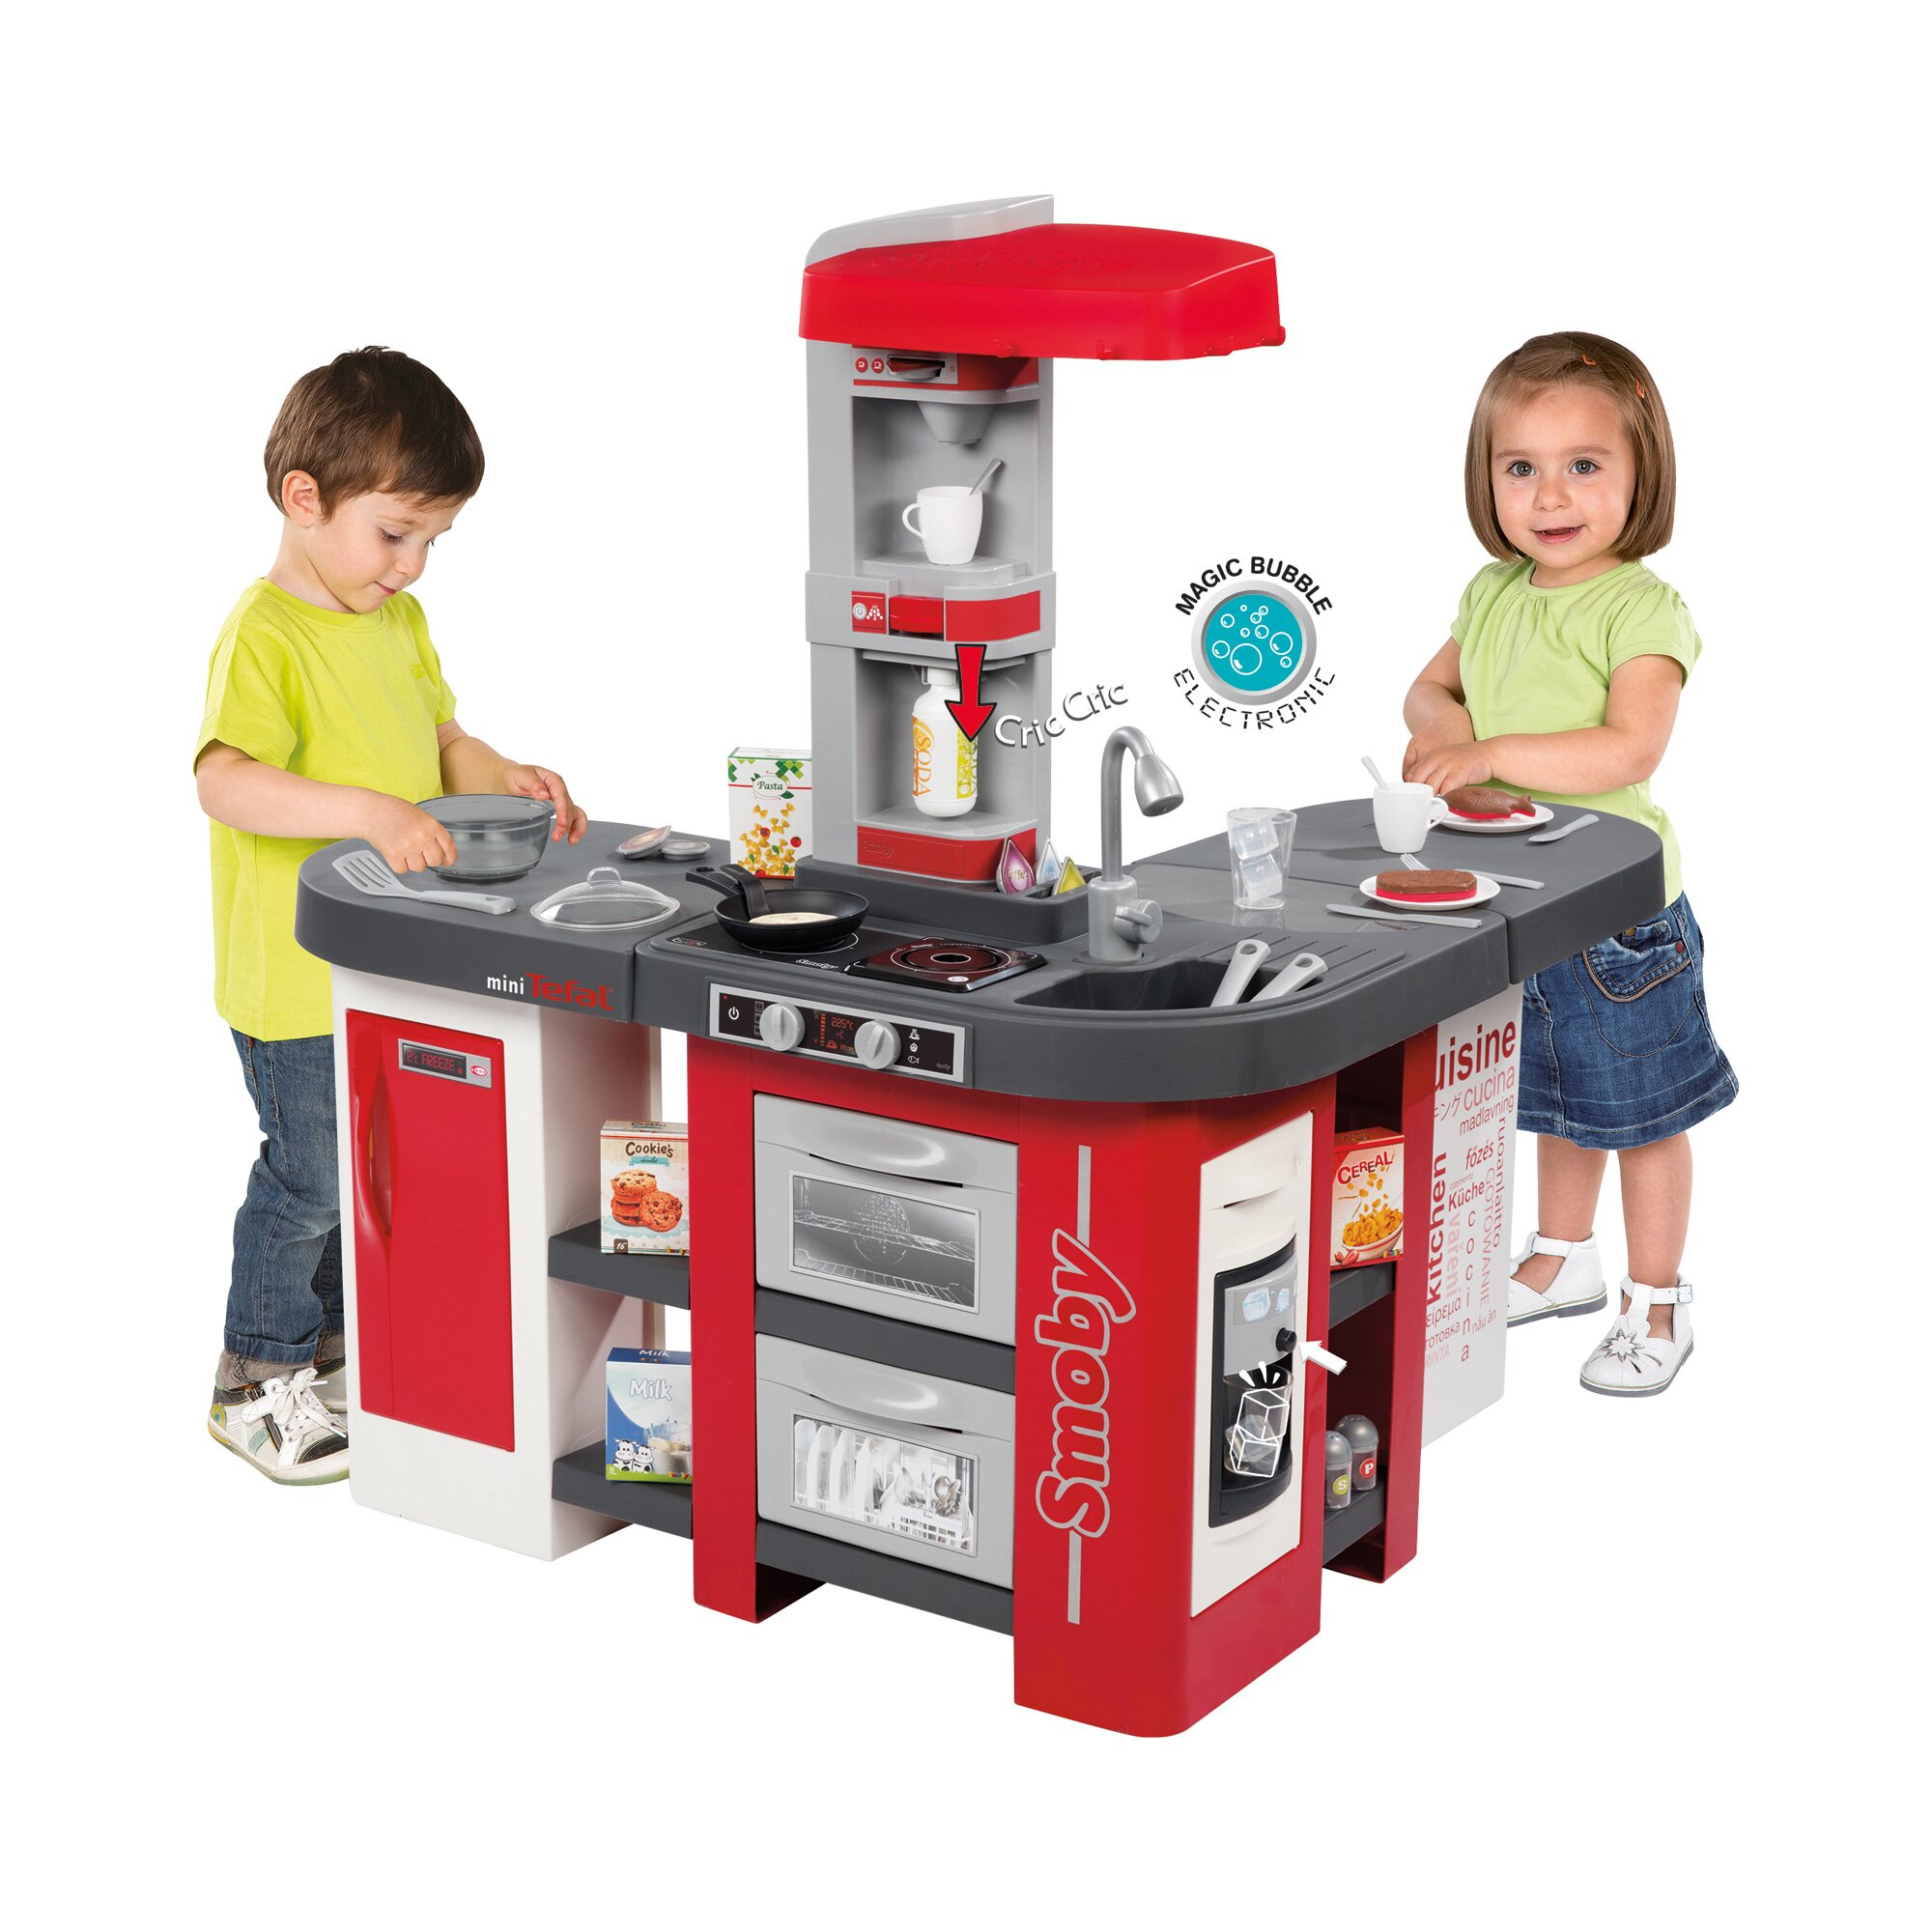 Smoby Kinderküche Tefal Studio Bubble XXL Preisvergleich